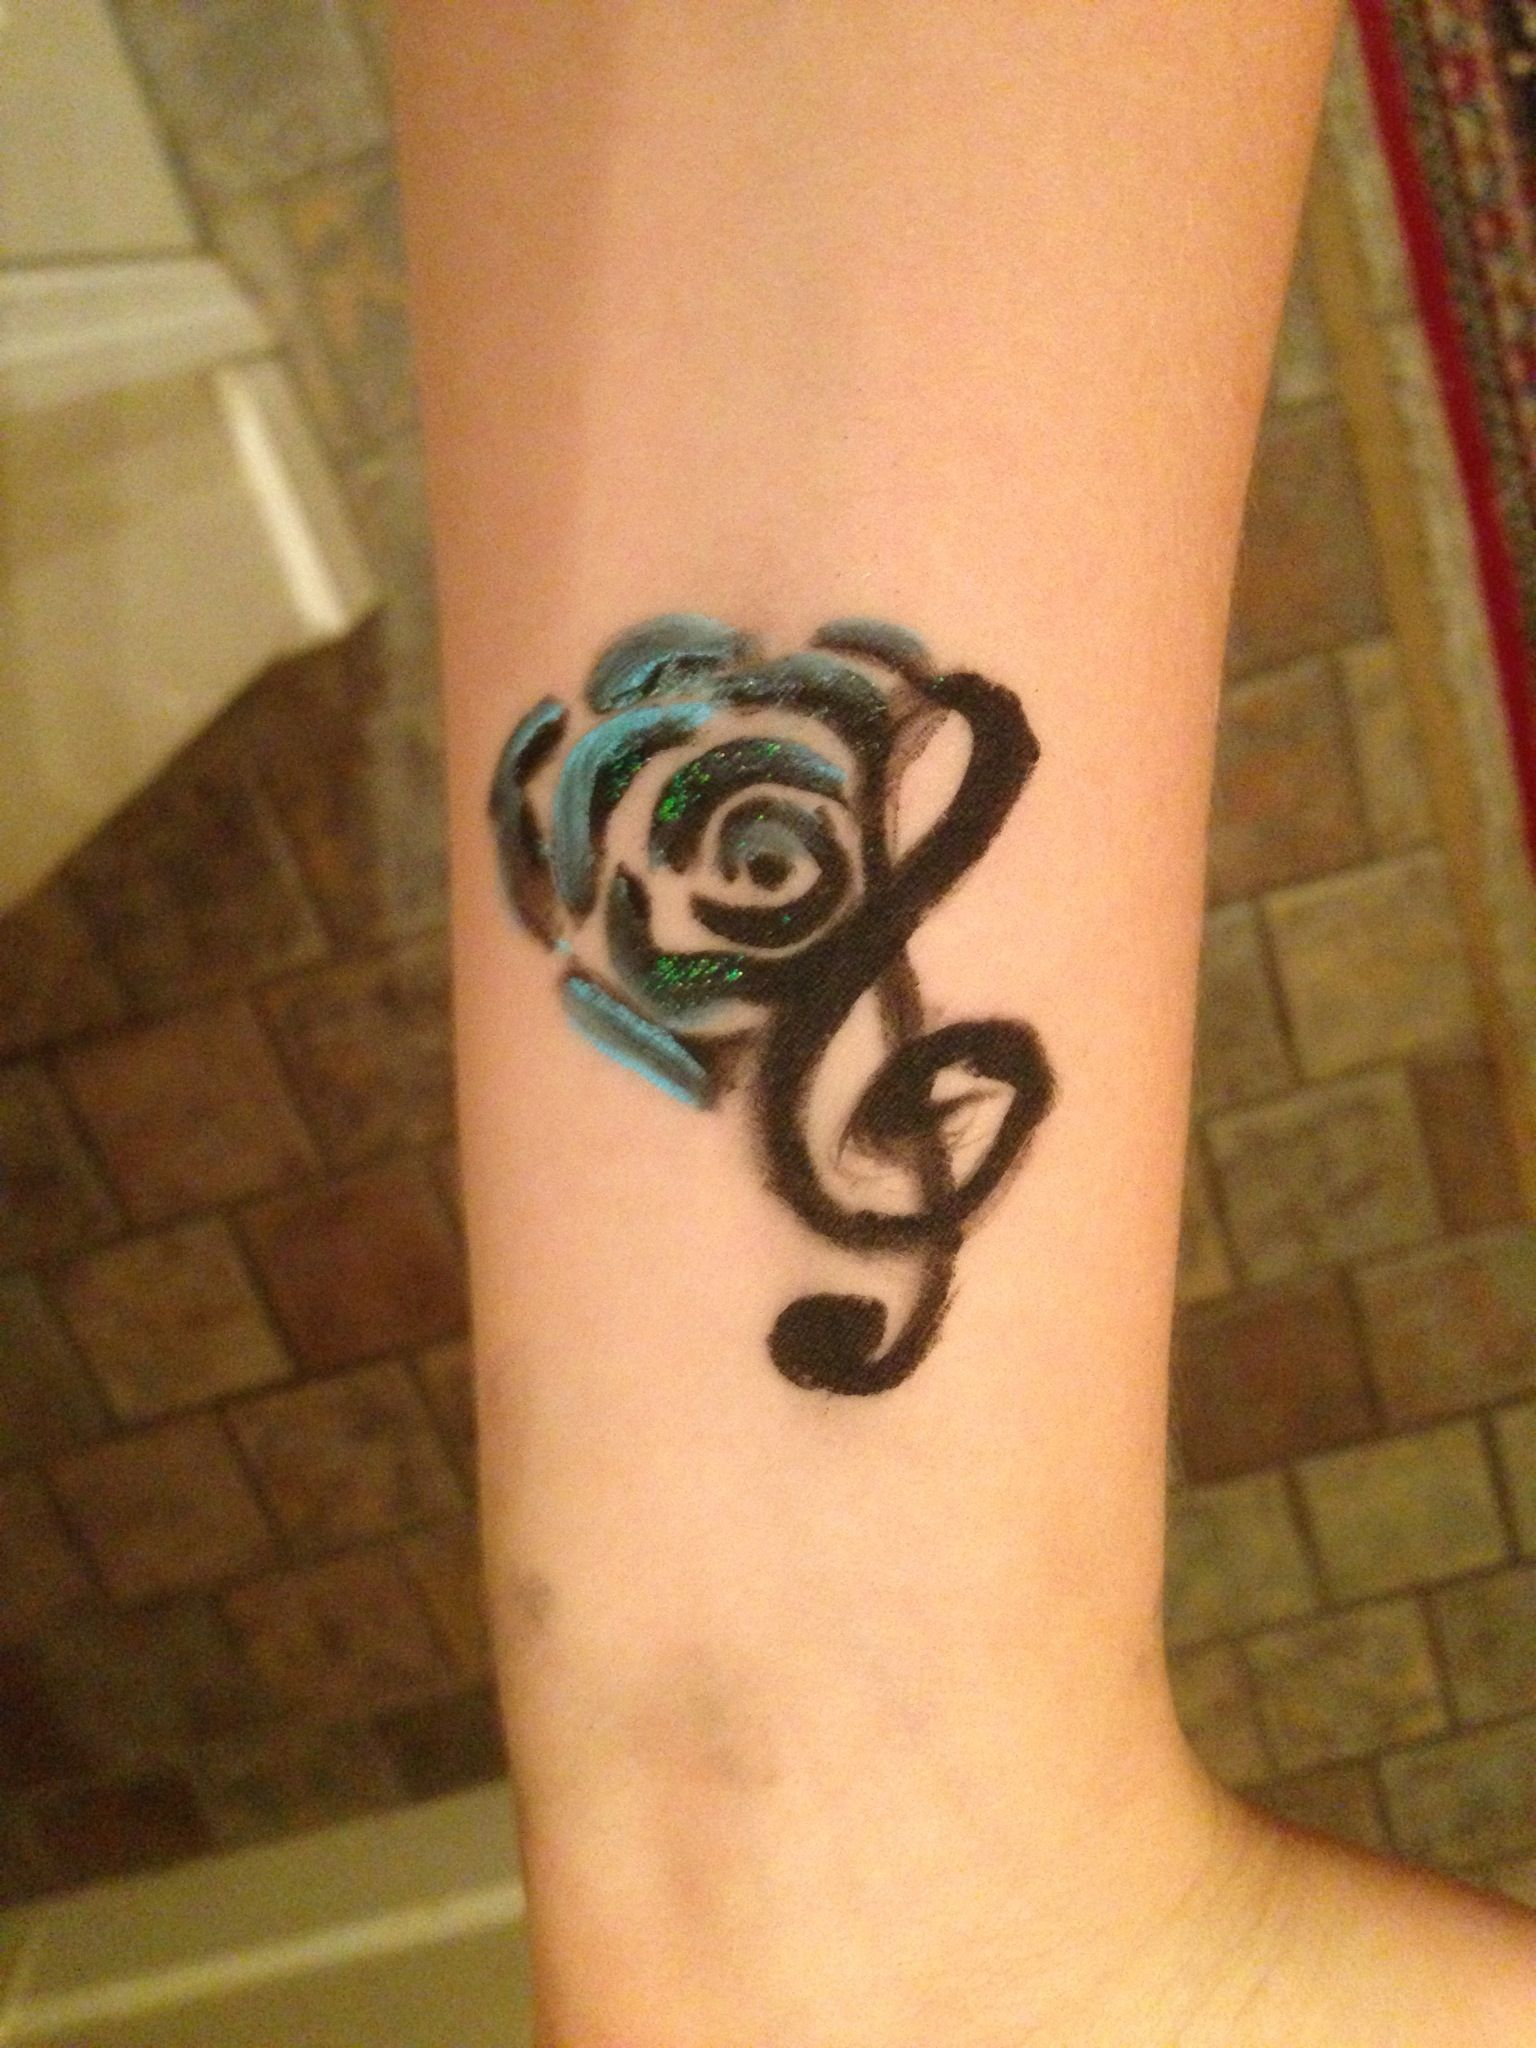 Music note & flower wrist tattoo, done in blue and glitter ...